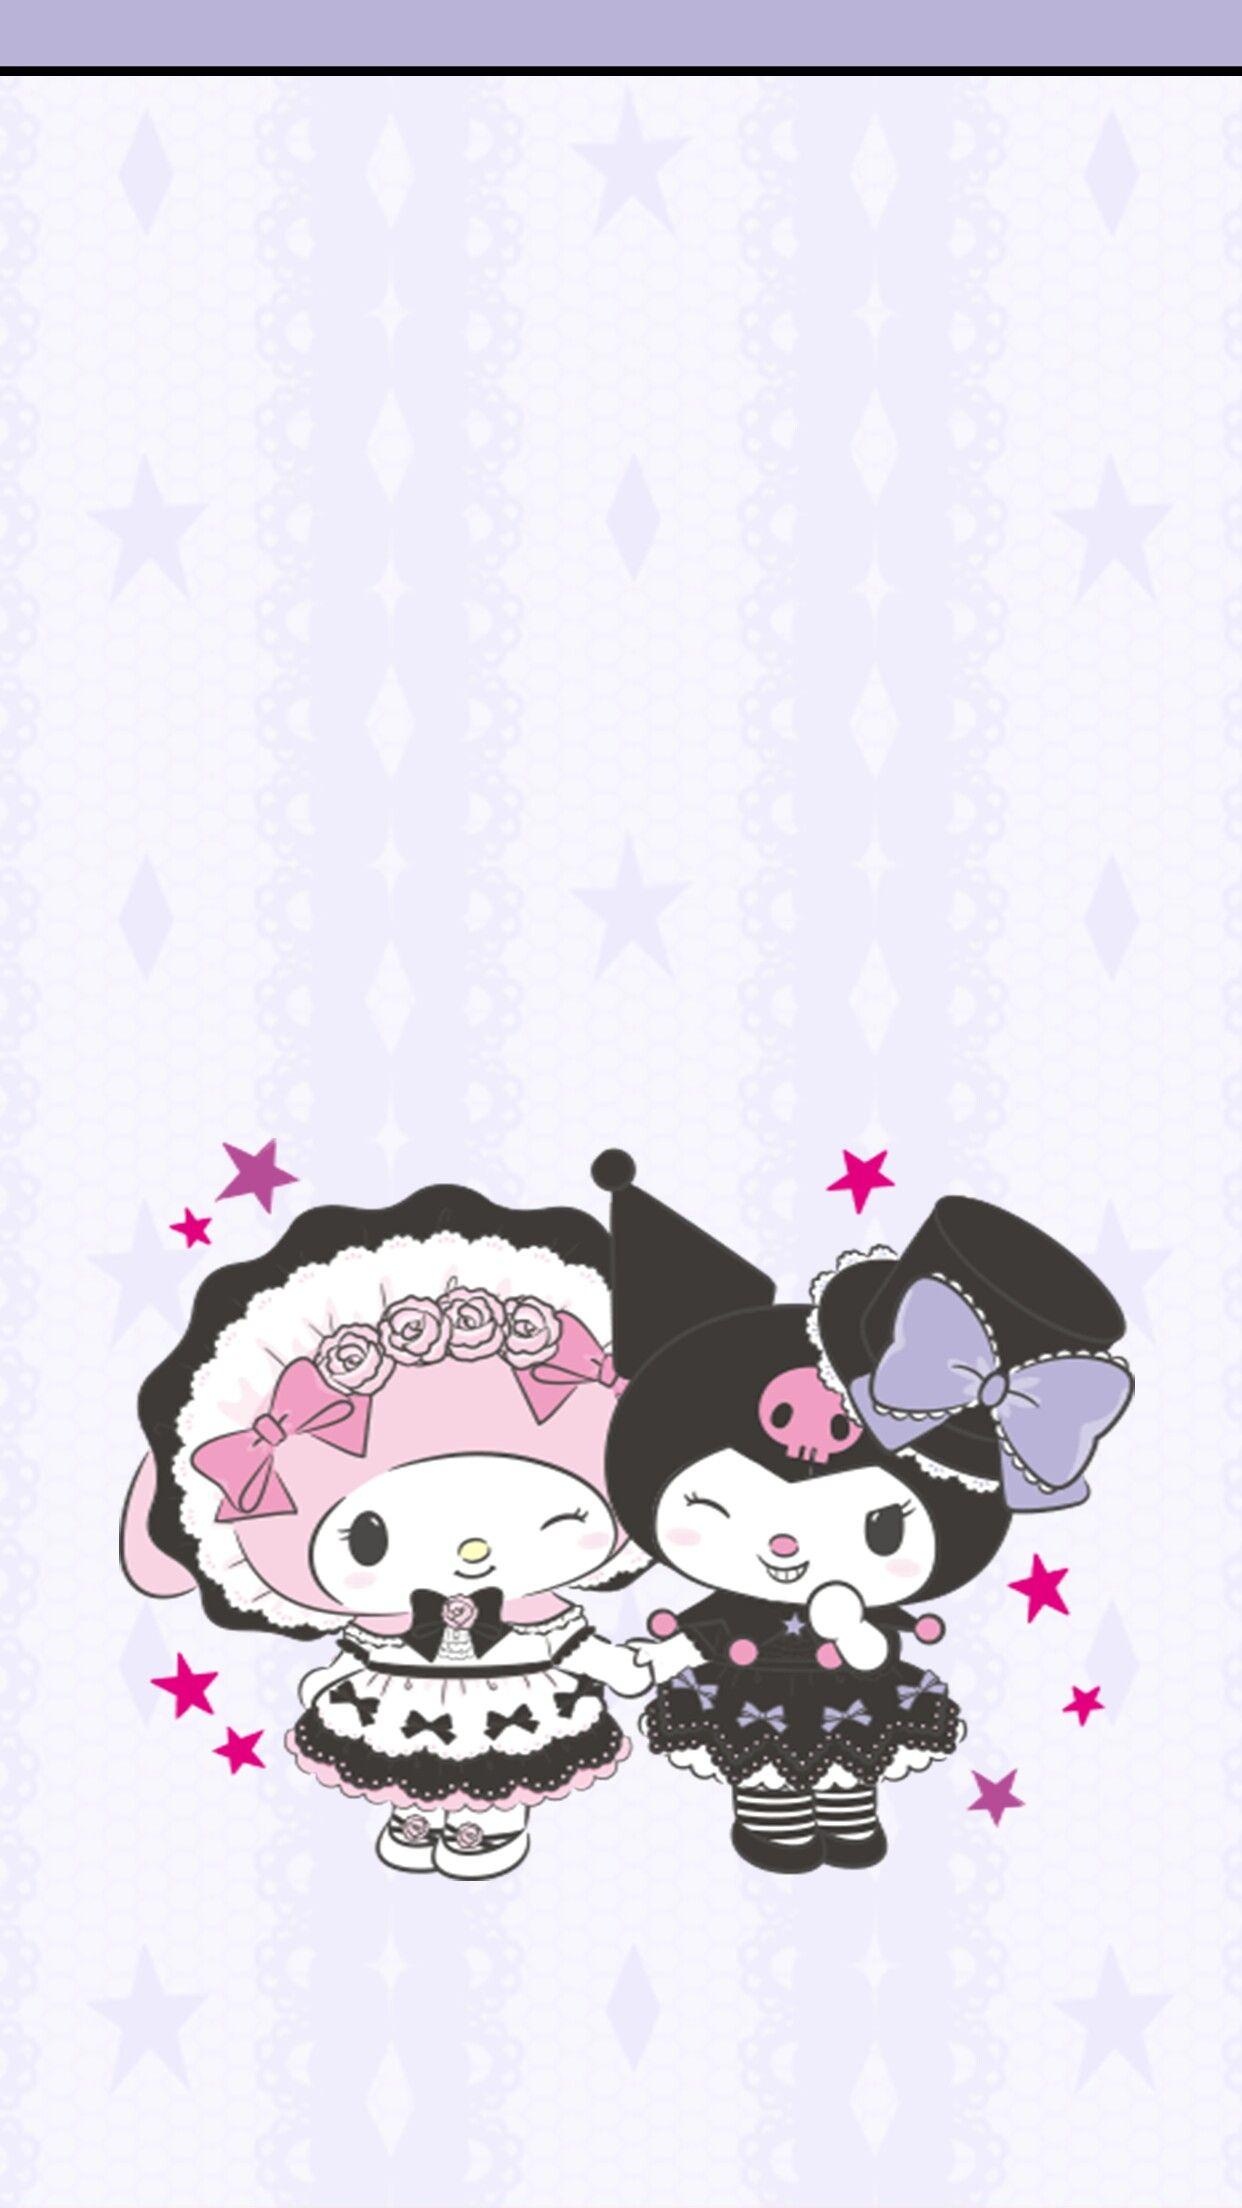 Spooky Cute Love Kawaii Wallpaper Sanrio Wallpaper Cute Girl Wallpaper